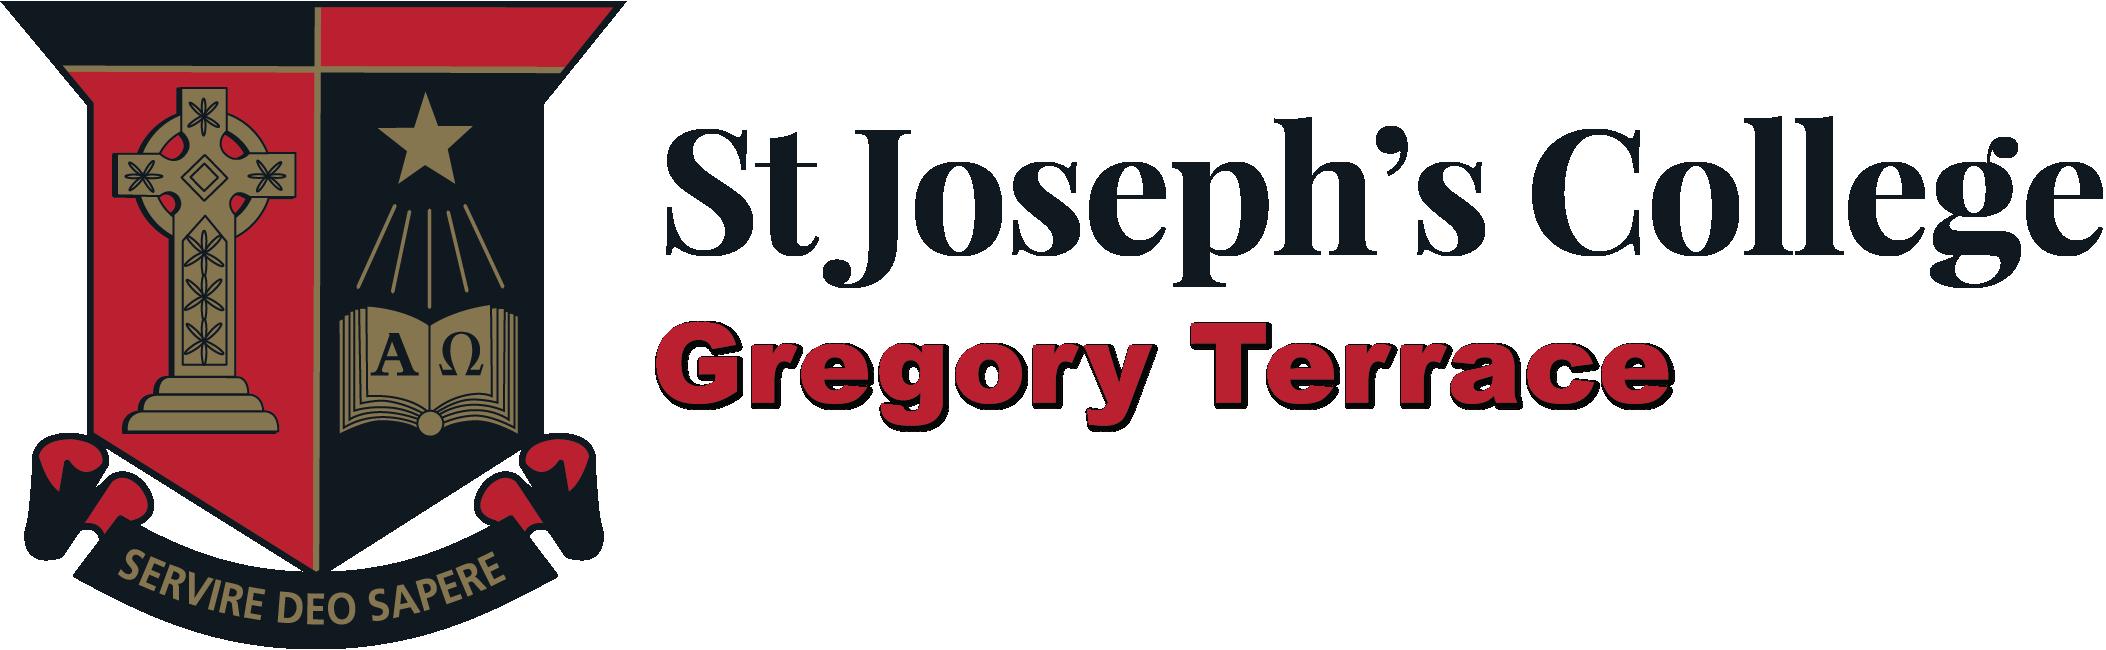 St Joseph's College Gregory Terrace